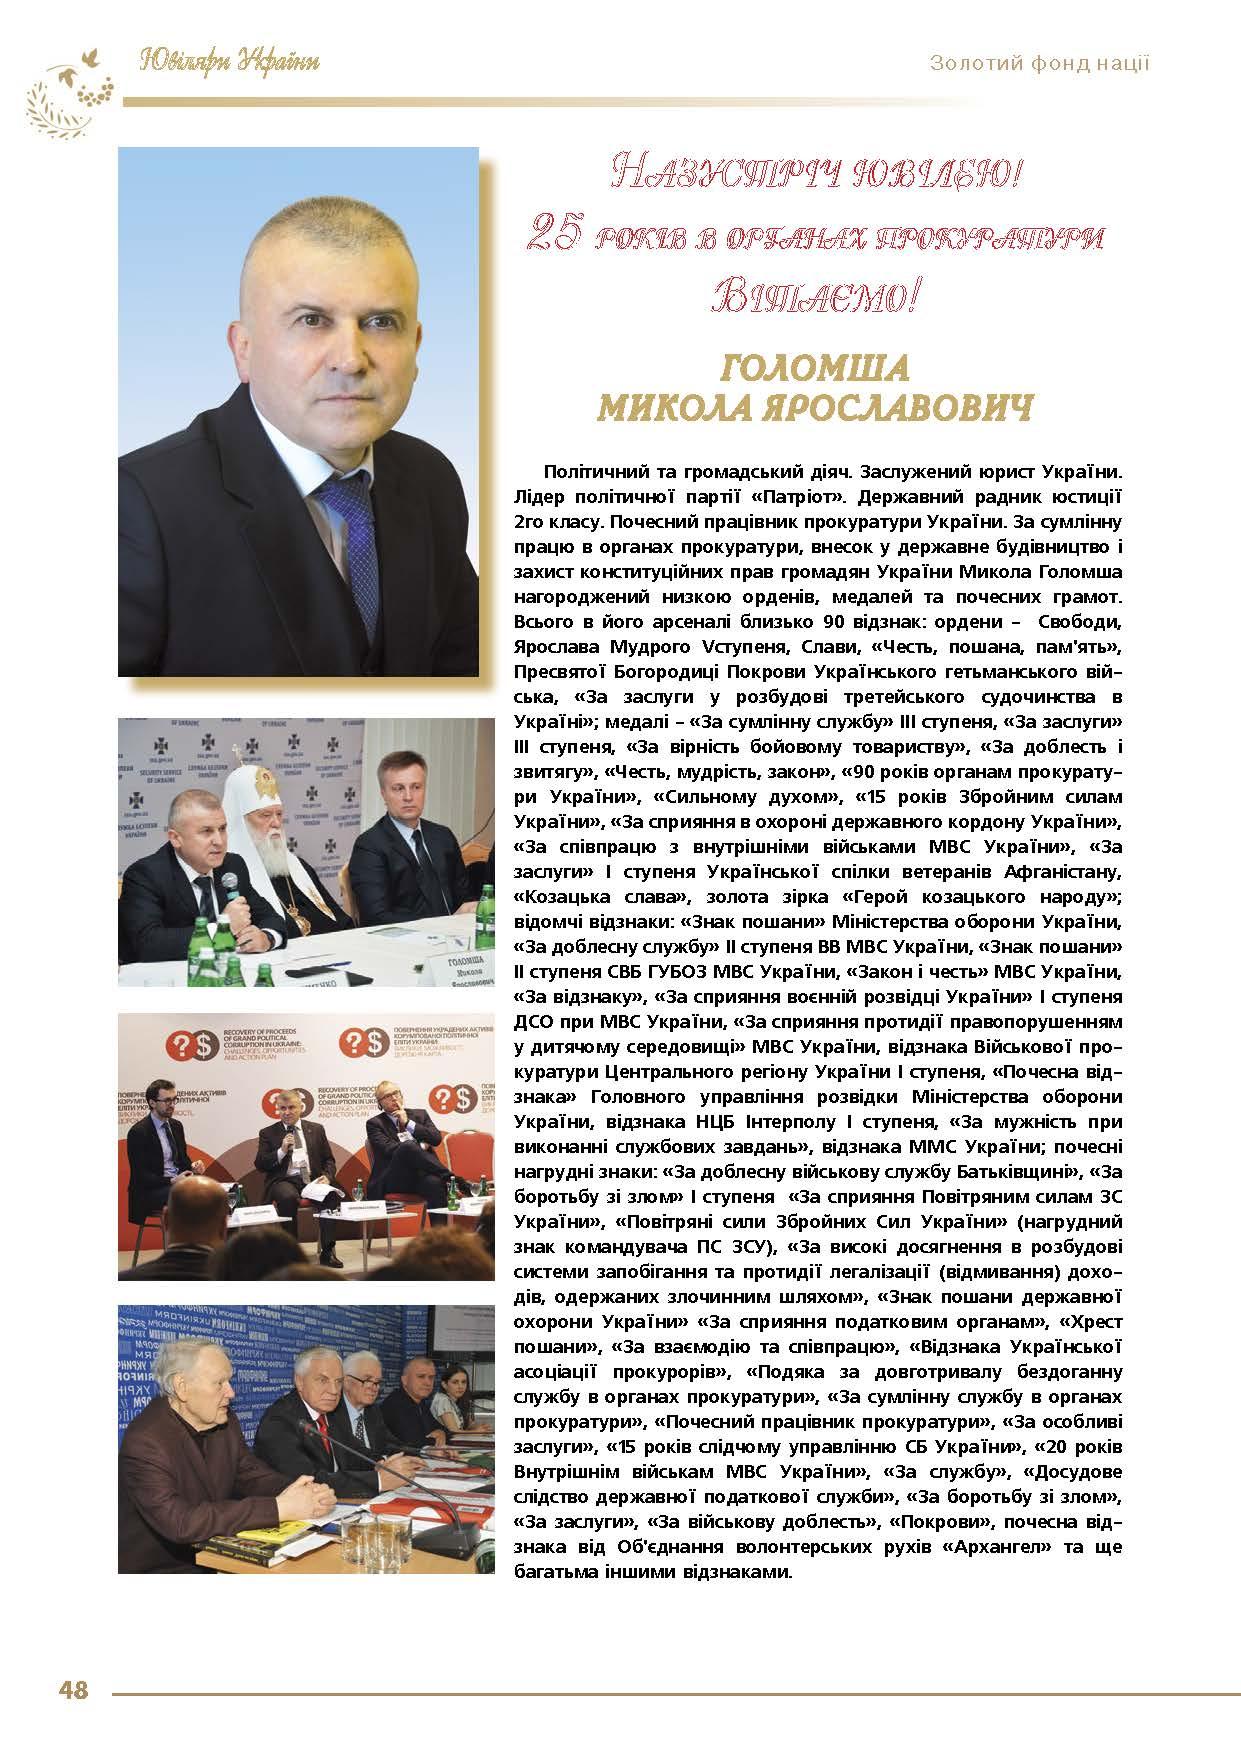 Голомша Микола Ярославович